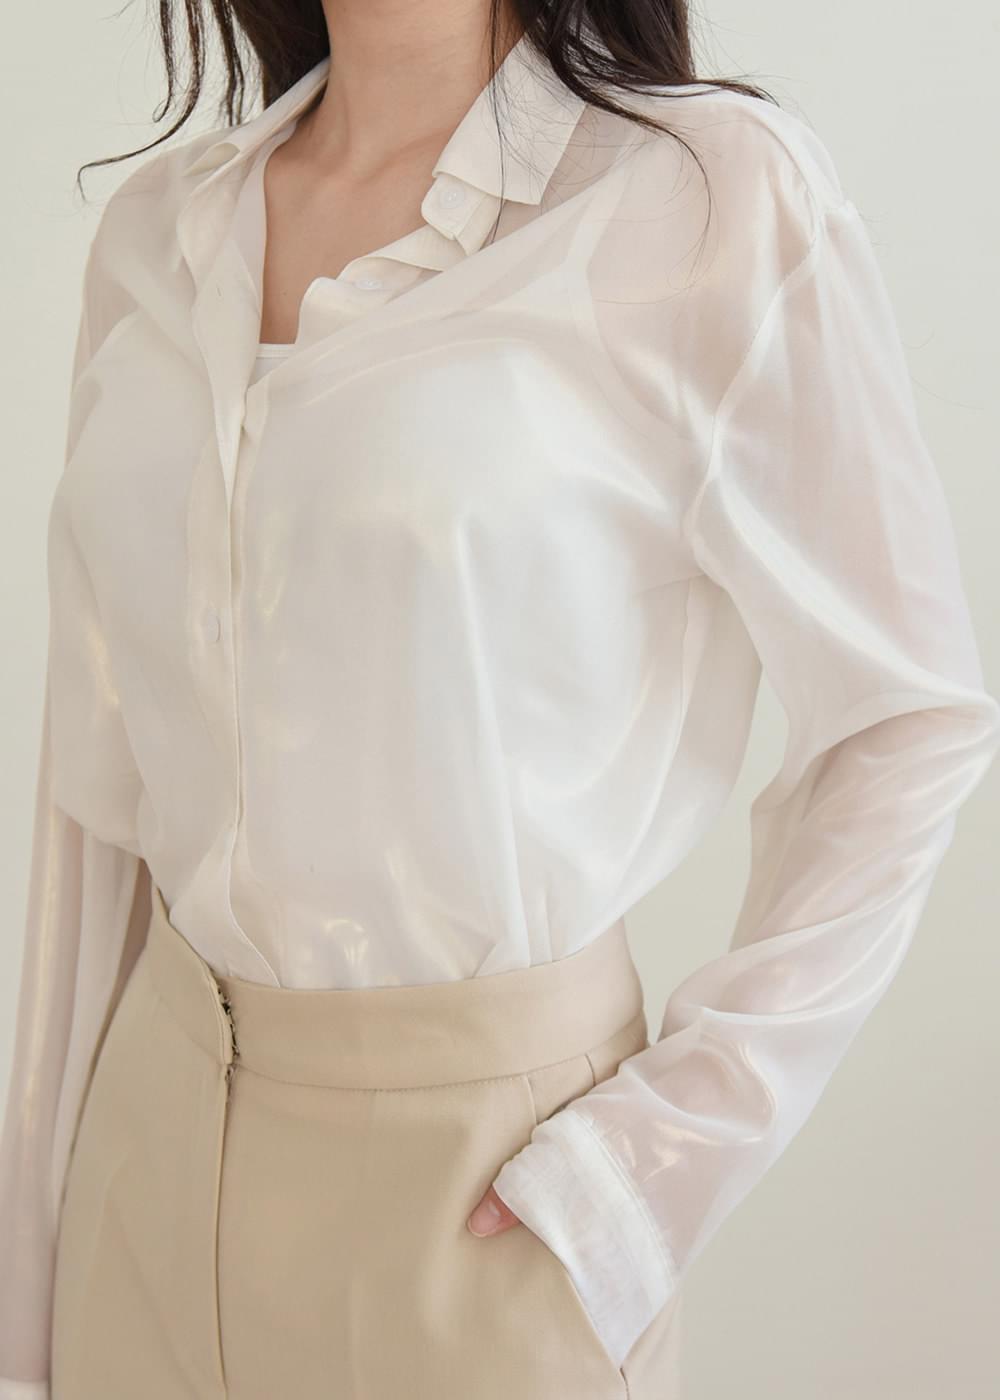 Silver silver see-through blouse